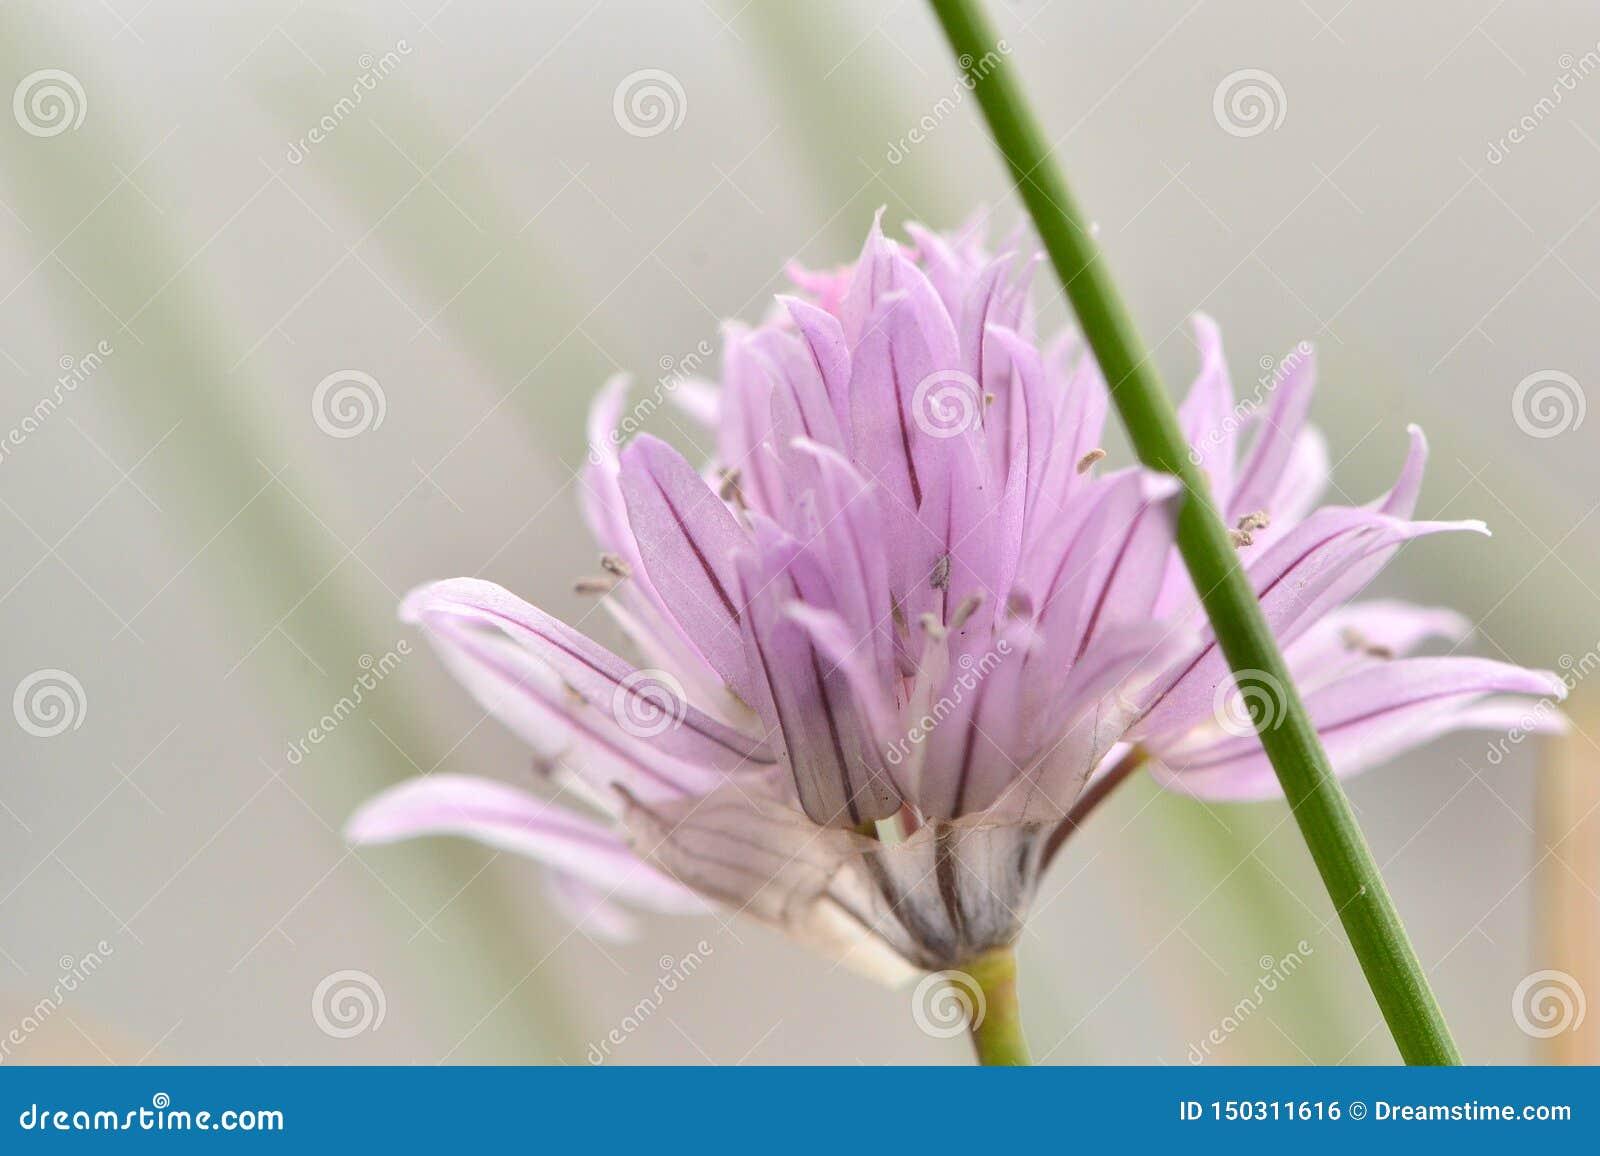 Конец цветка Chives пурпурный вверх